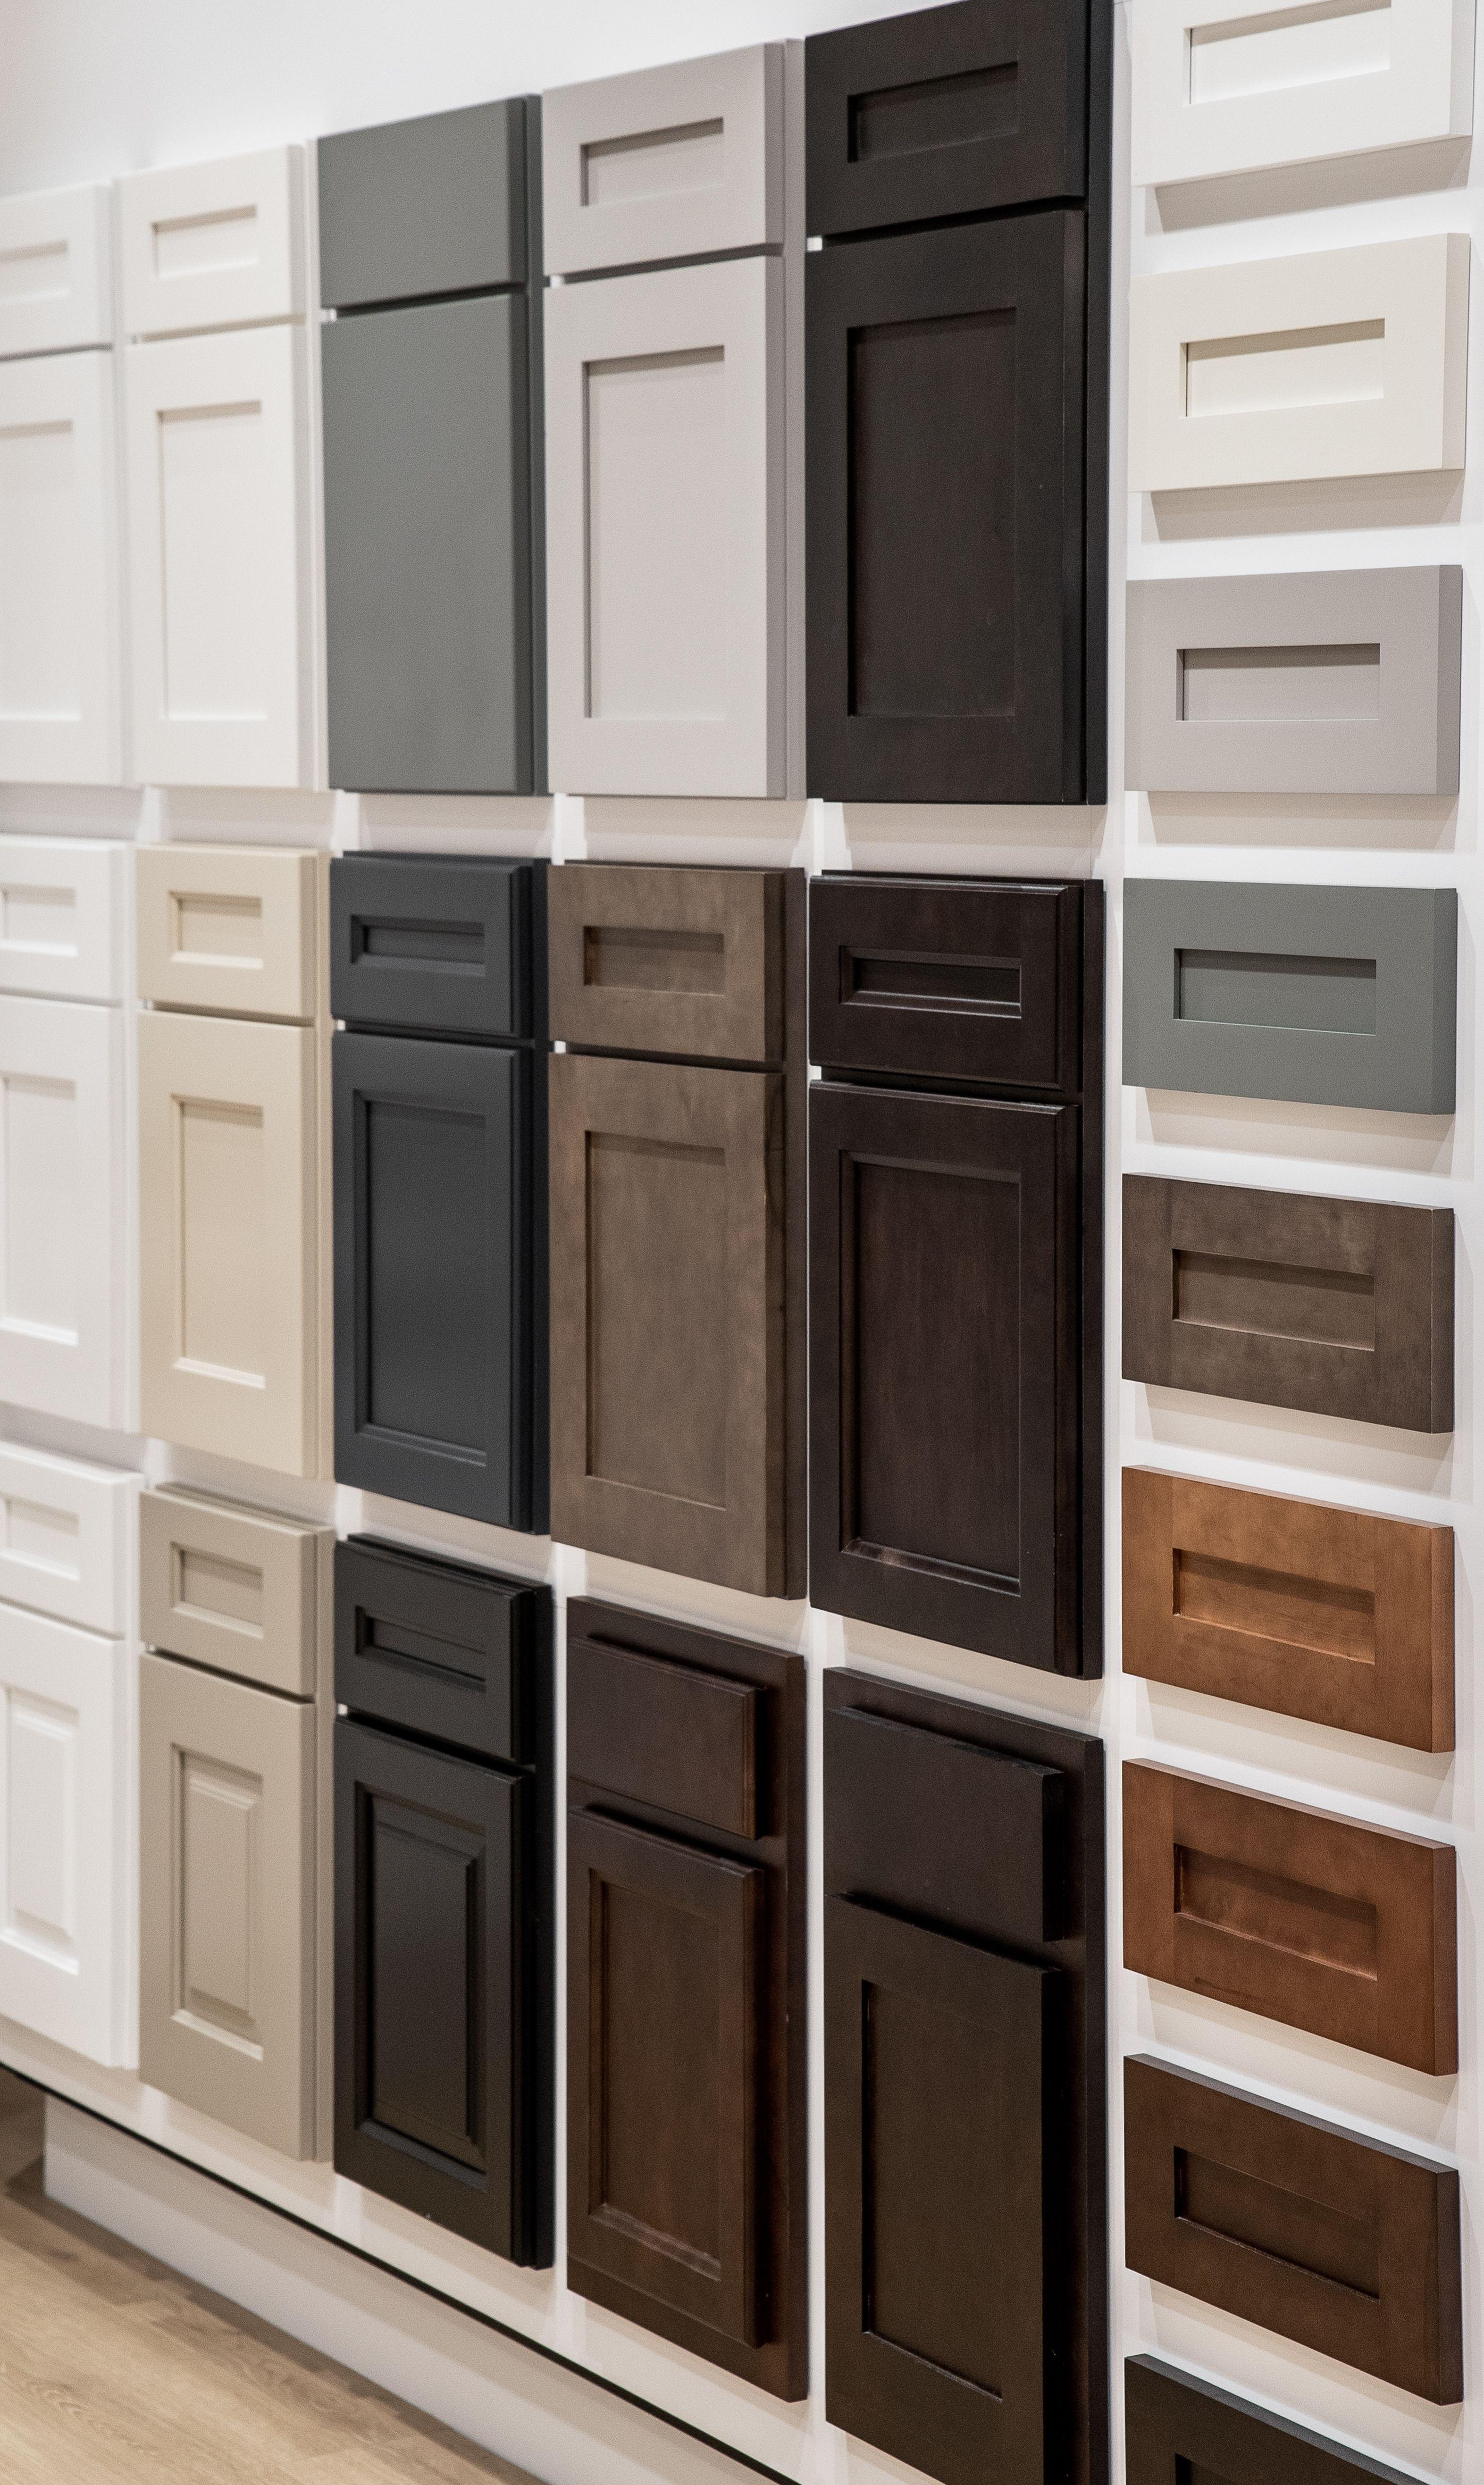 Design Studio Edgehomes In 2020 Kitchen Cabinets Showroom Kitchen Cabinet Door Styles Kitchen Furniture Design